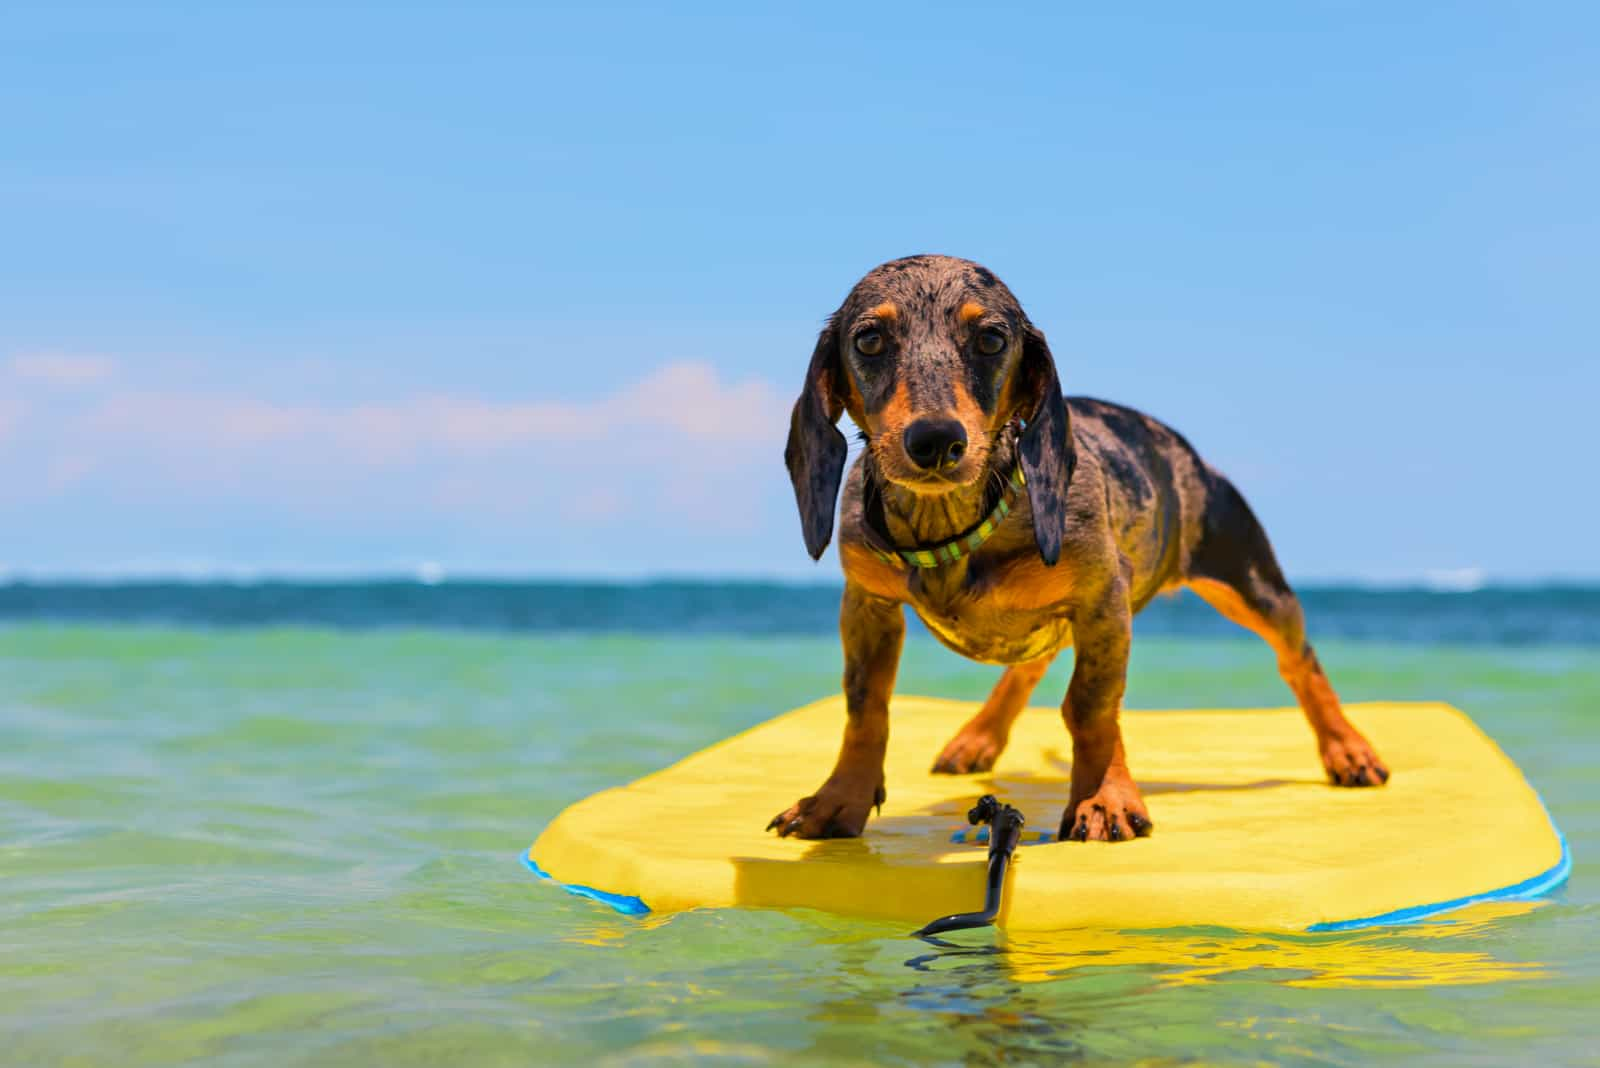 dog surfing on the beach